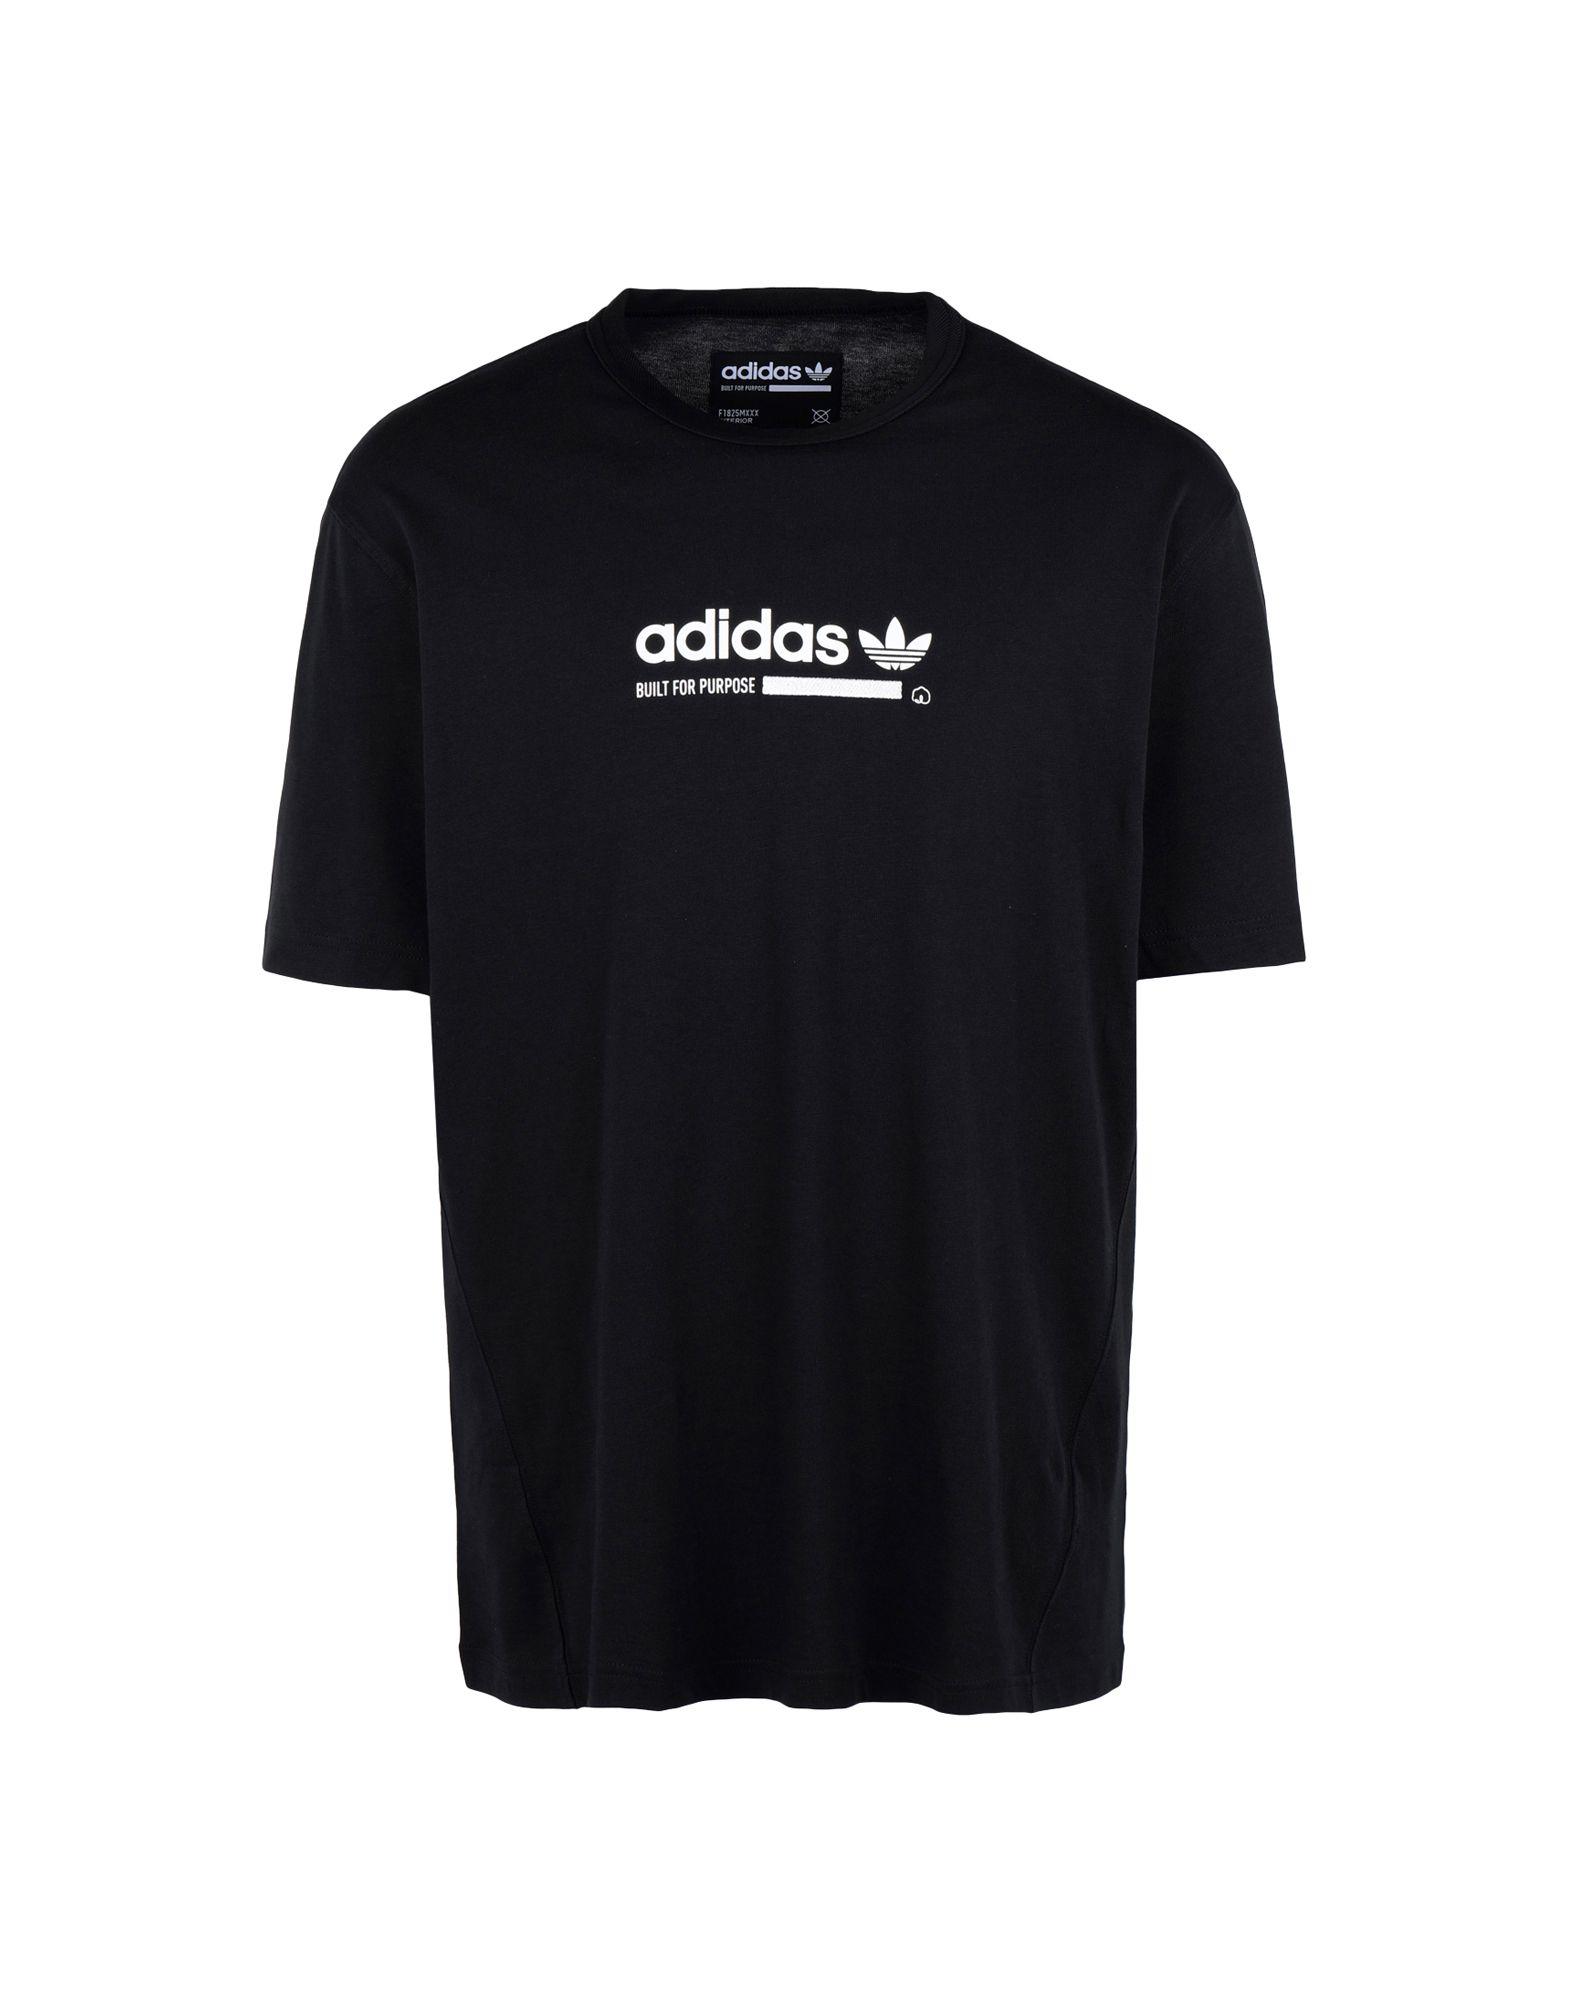 ADIDAS ORIGINALS Футболка рюкзак adidas 2050 2015